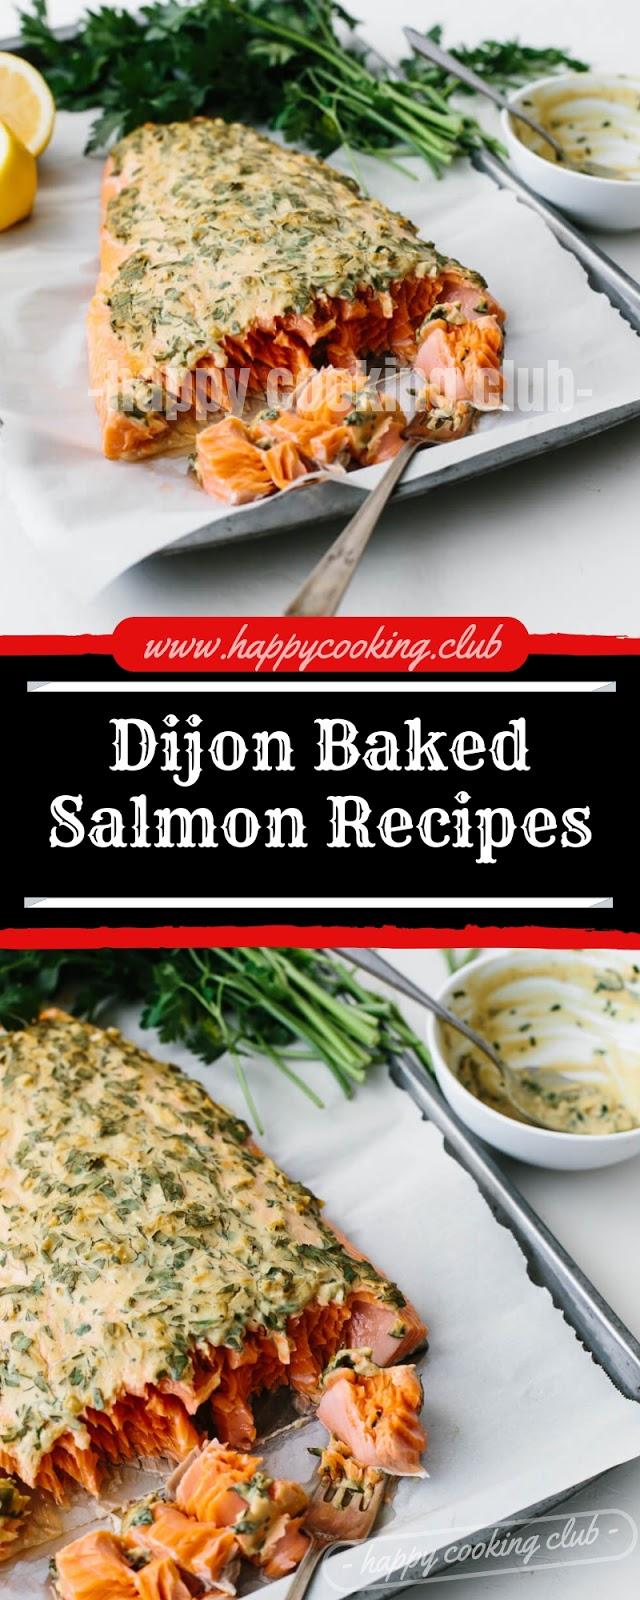 Dijon Baked Salmon Recipes